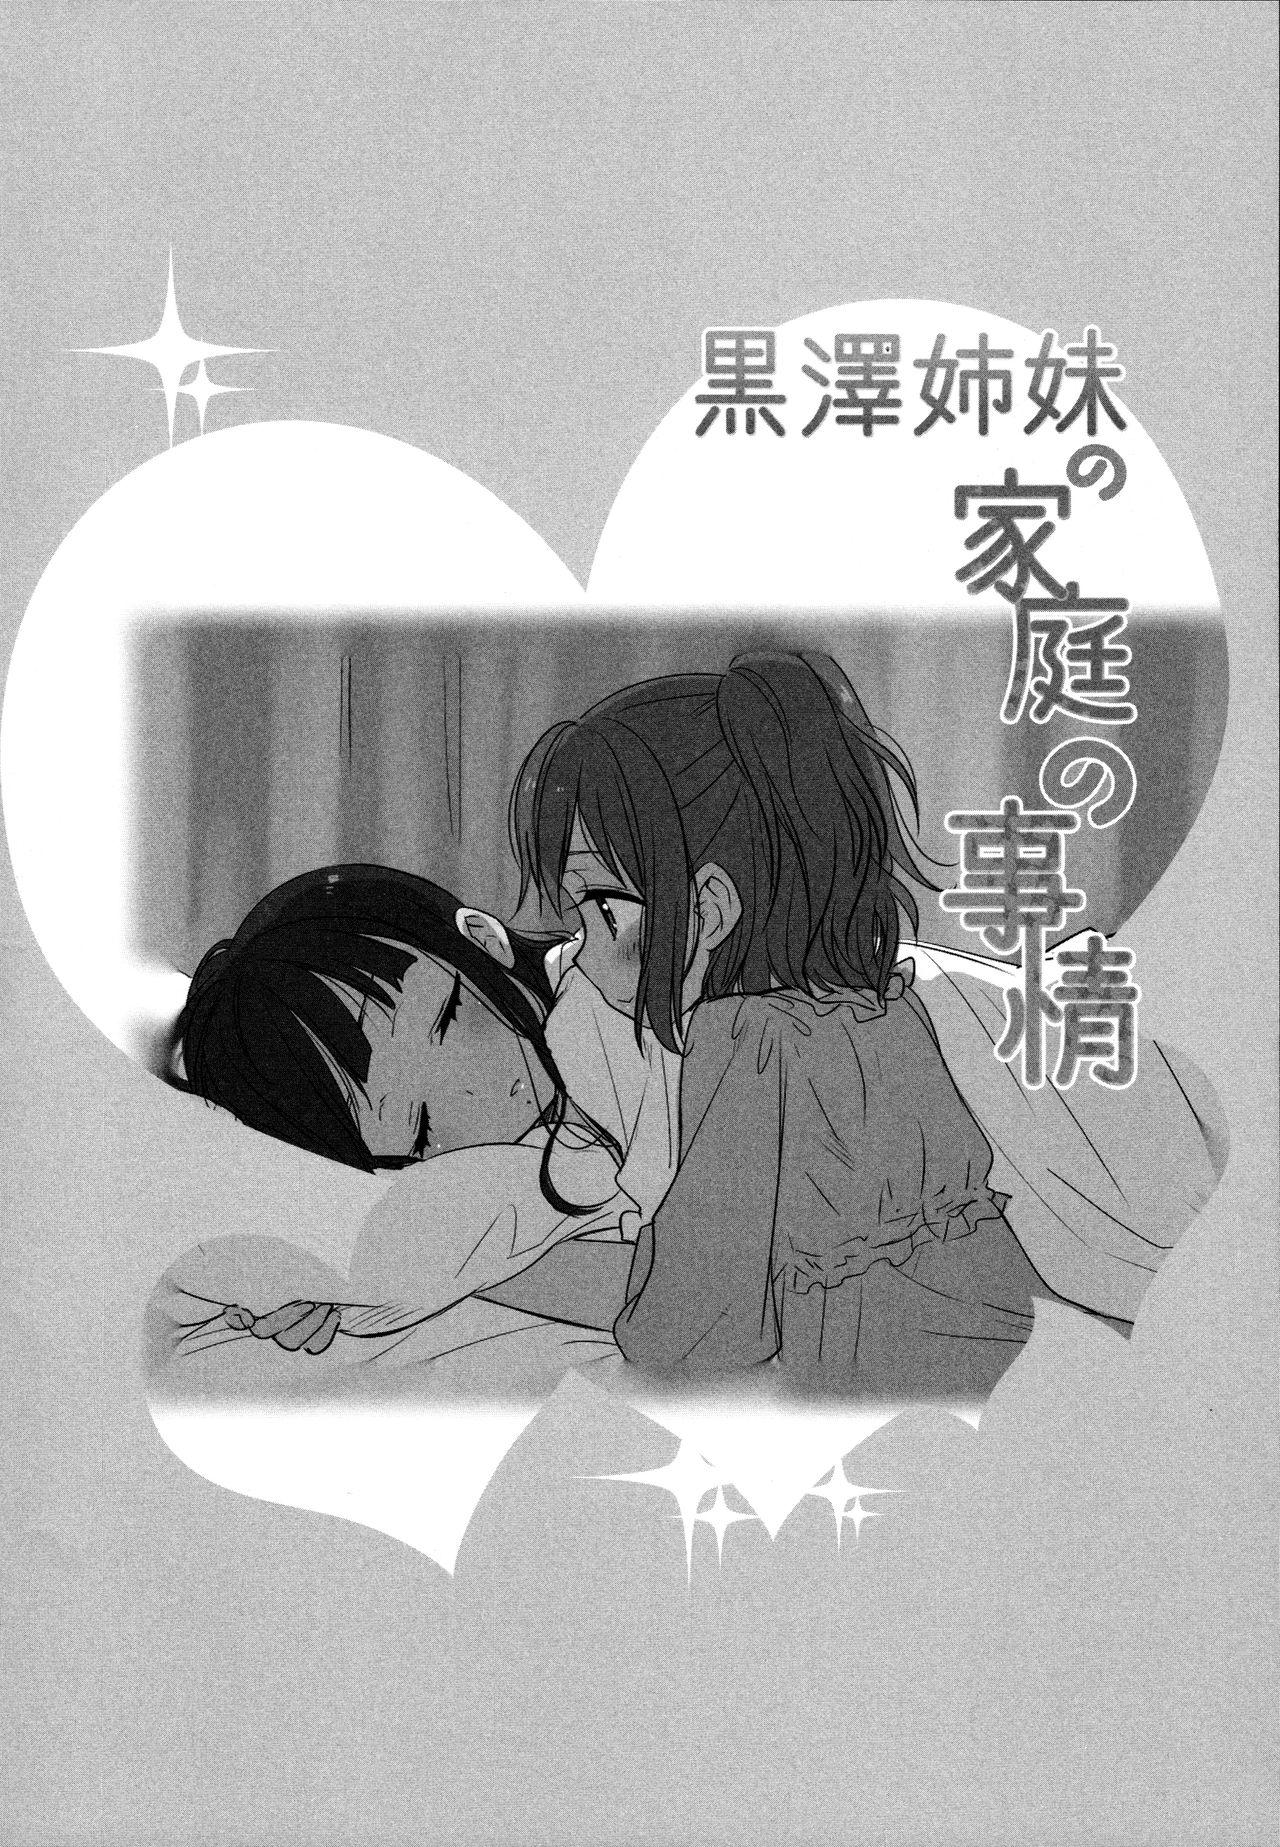 Kurosawa Shimai no Katei no Jijou | State of Affairs in The Kurosawa Sister's Family Home 3